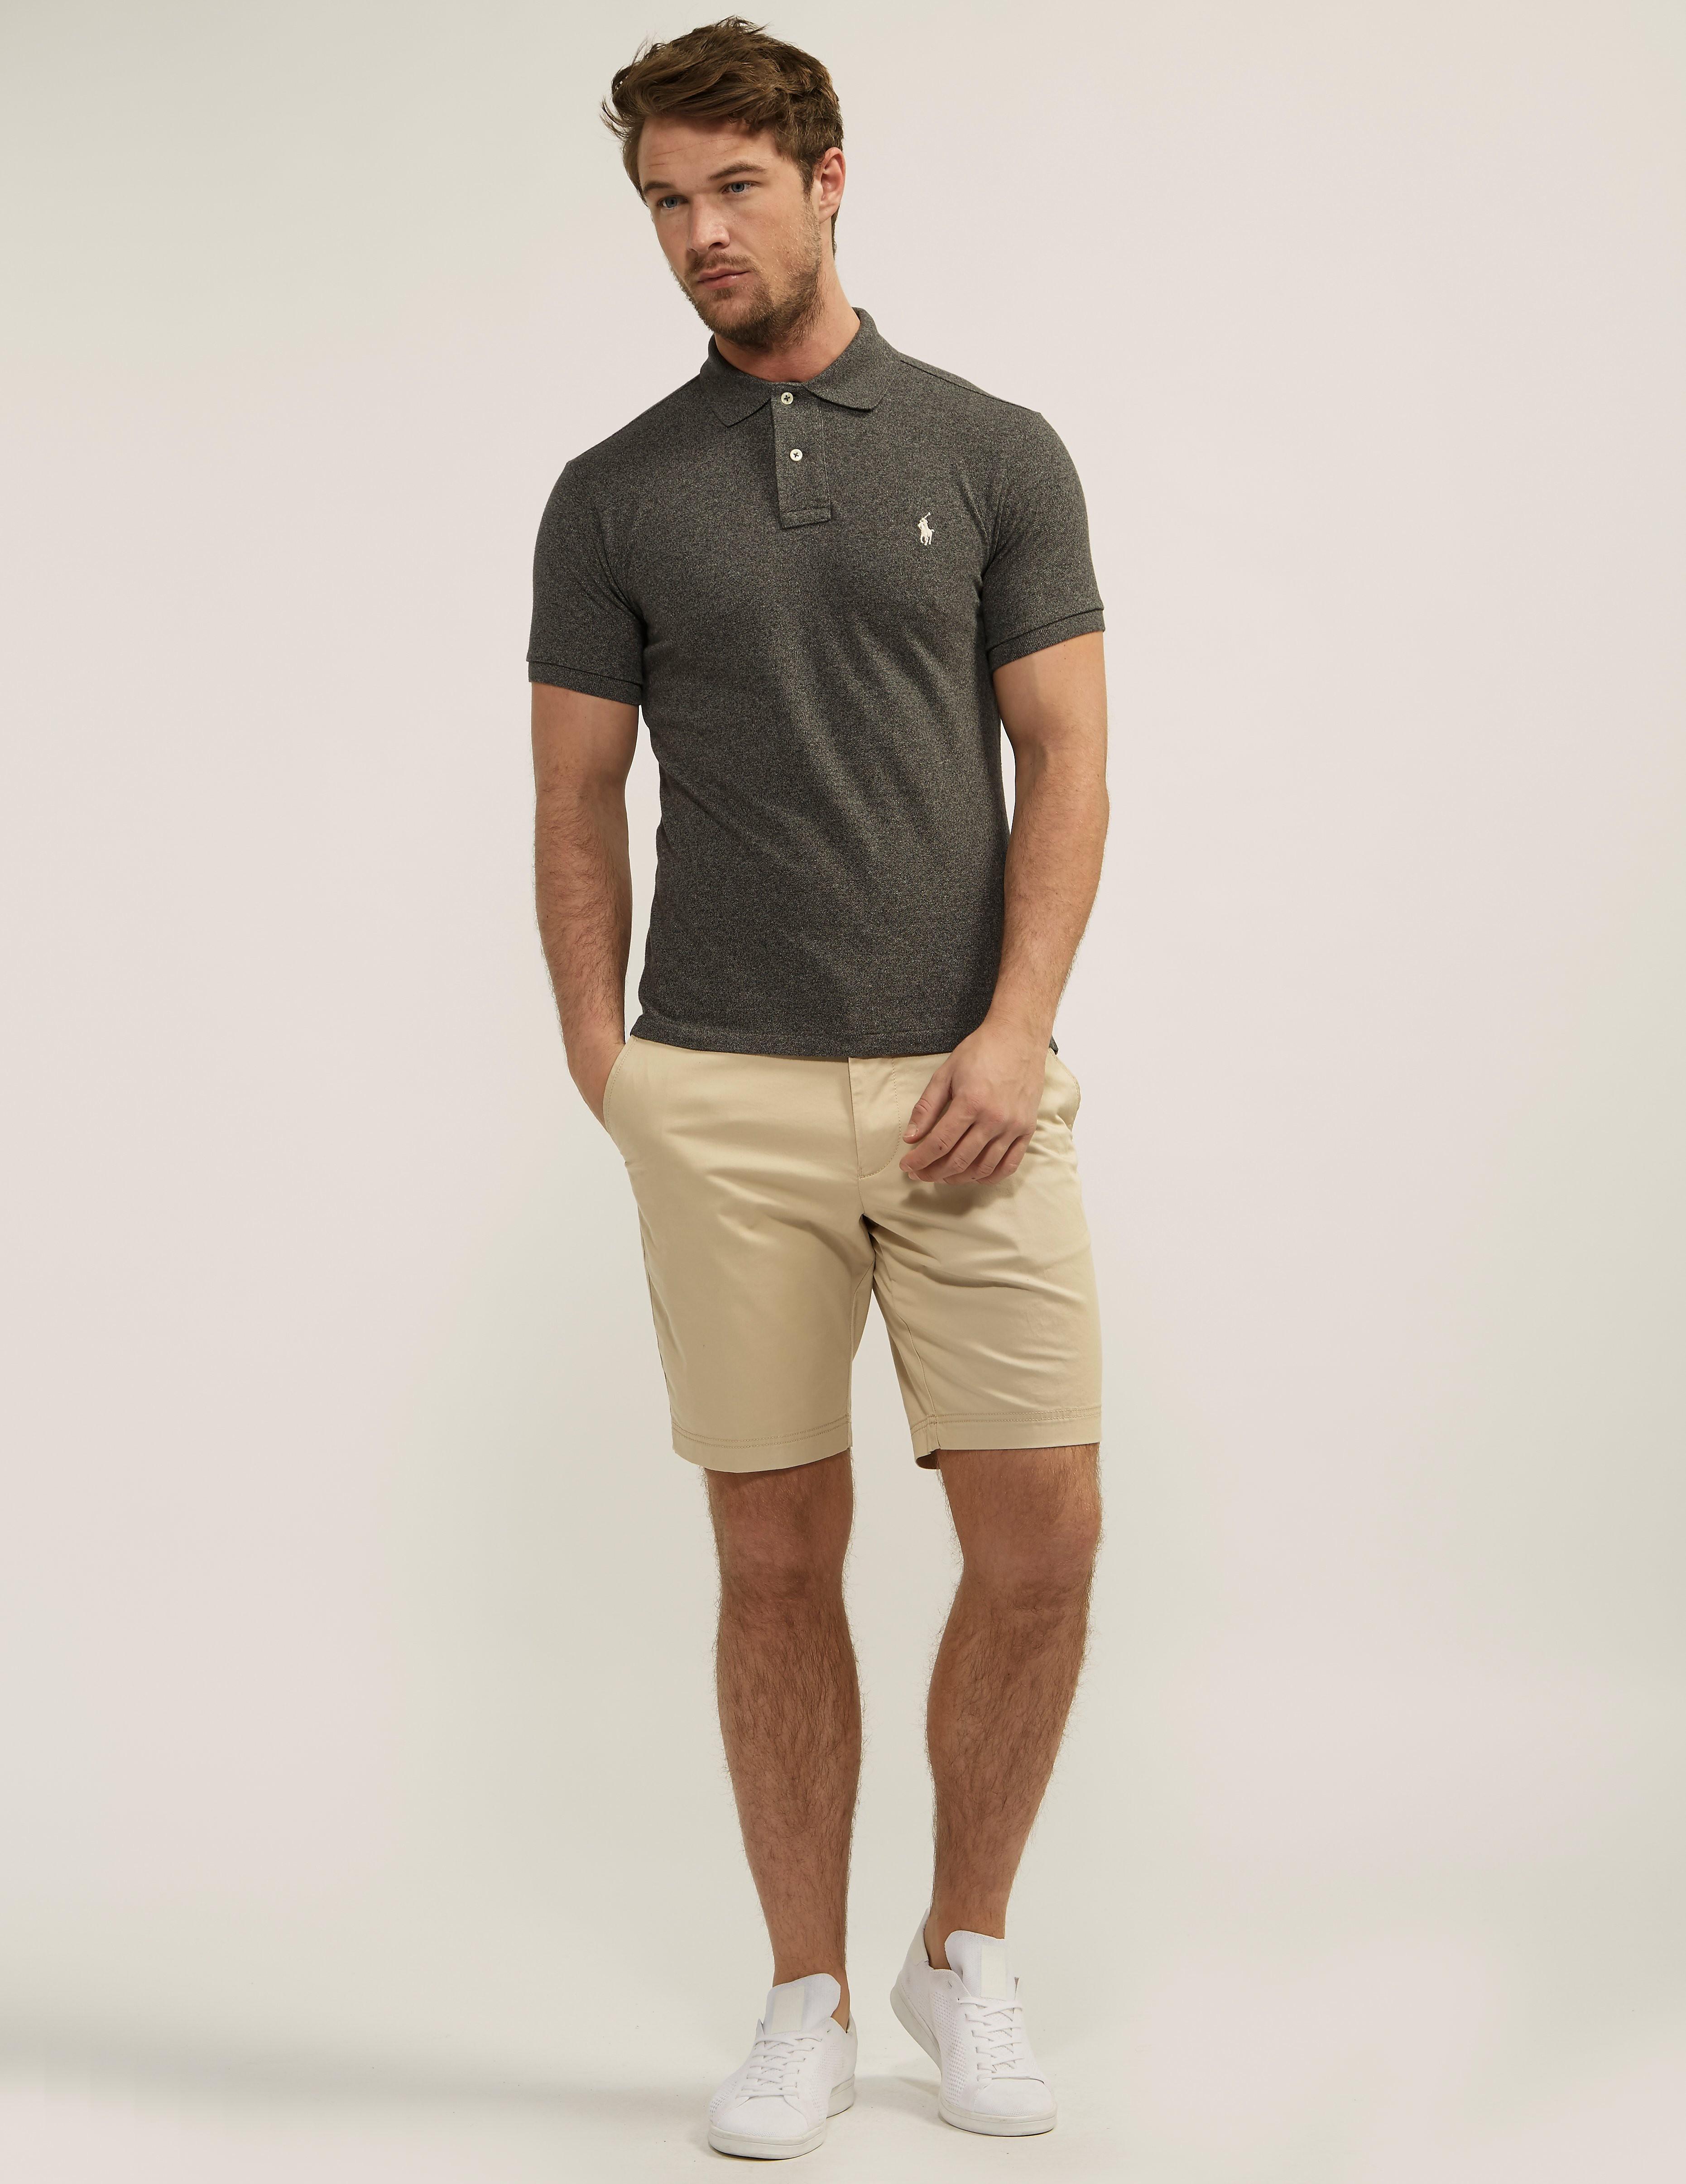 Polo Ralph Lauren Marl Slim Fit Short Sleeve Polo Shirt